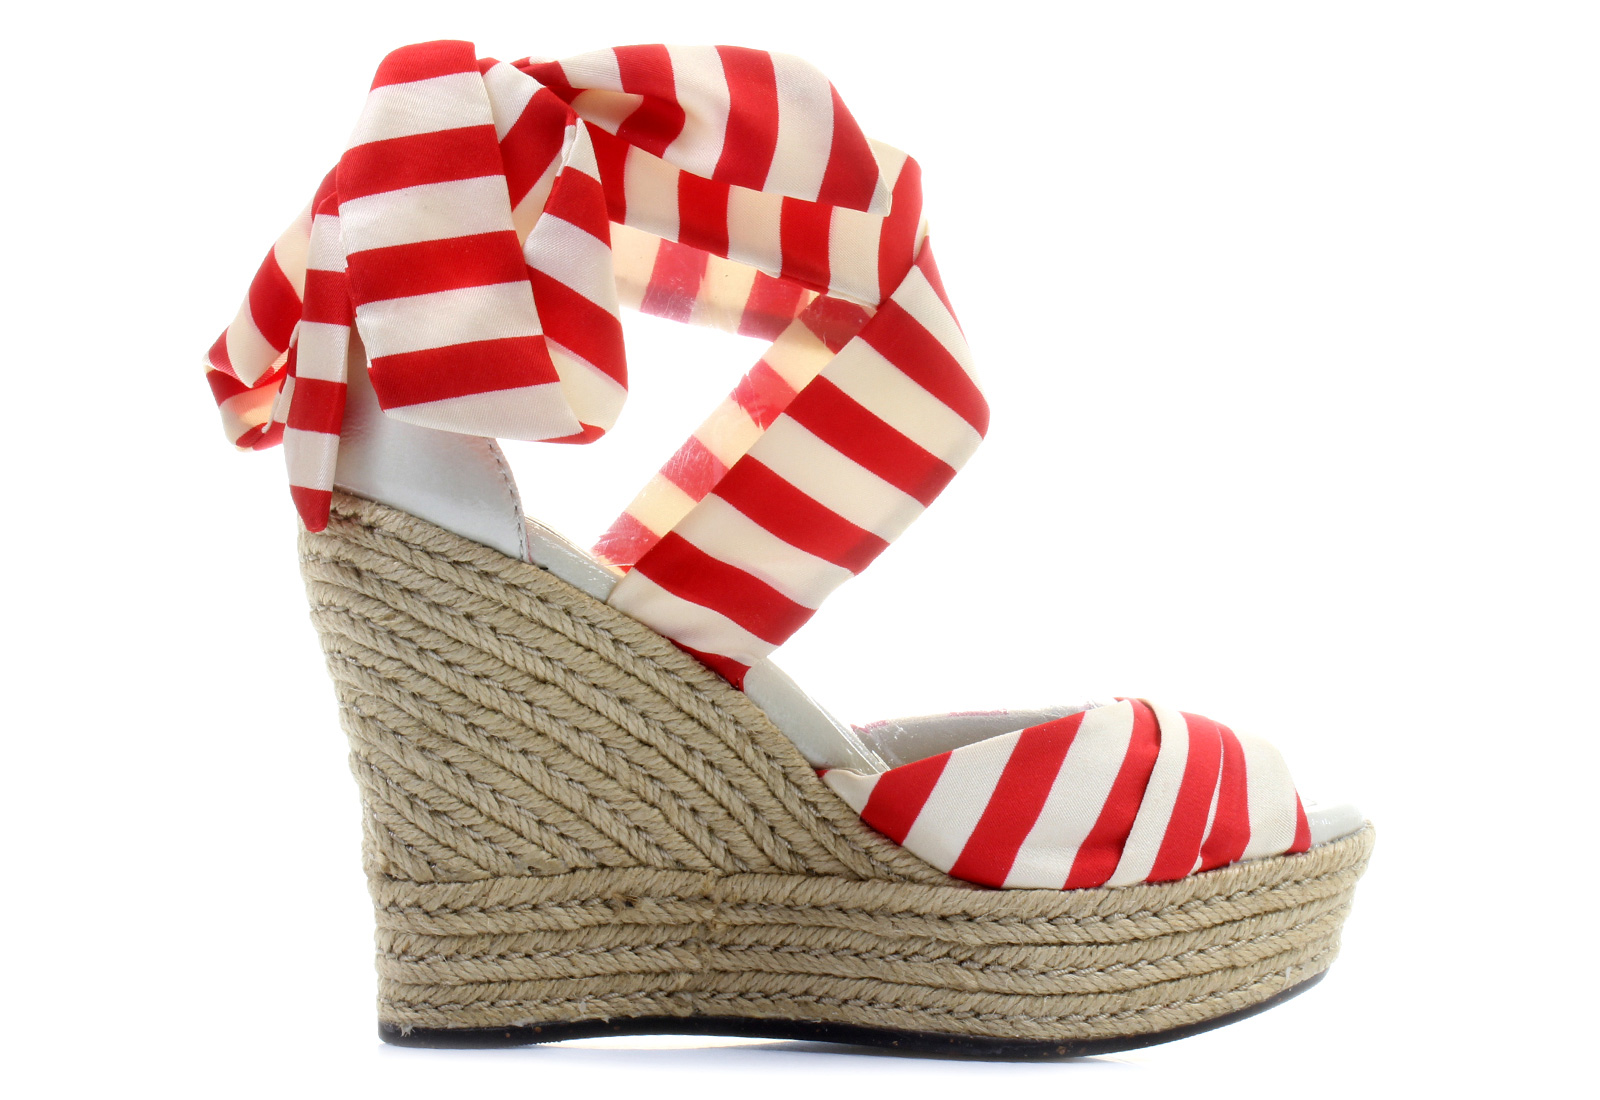 54c585937 Ugg Sandals - W Lucianna Stripe - 1004566-tms - Online shop for ...